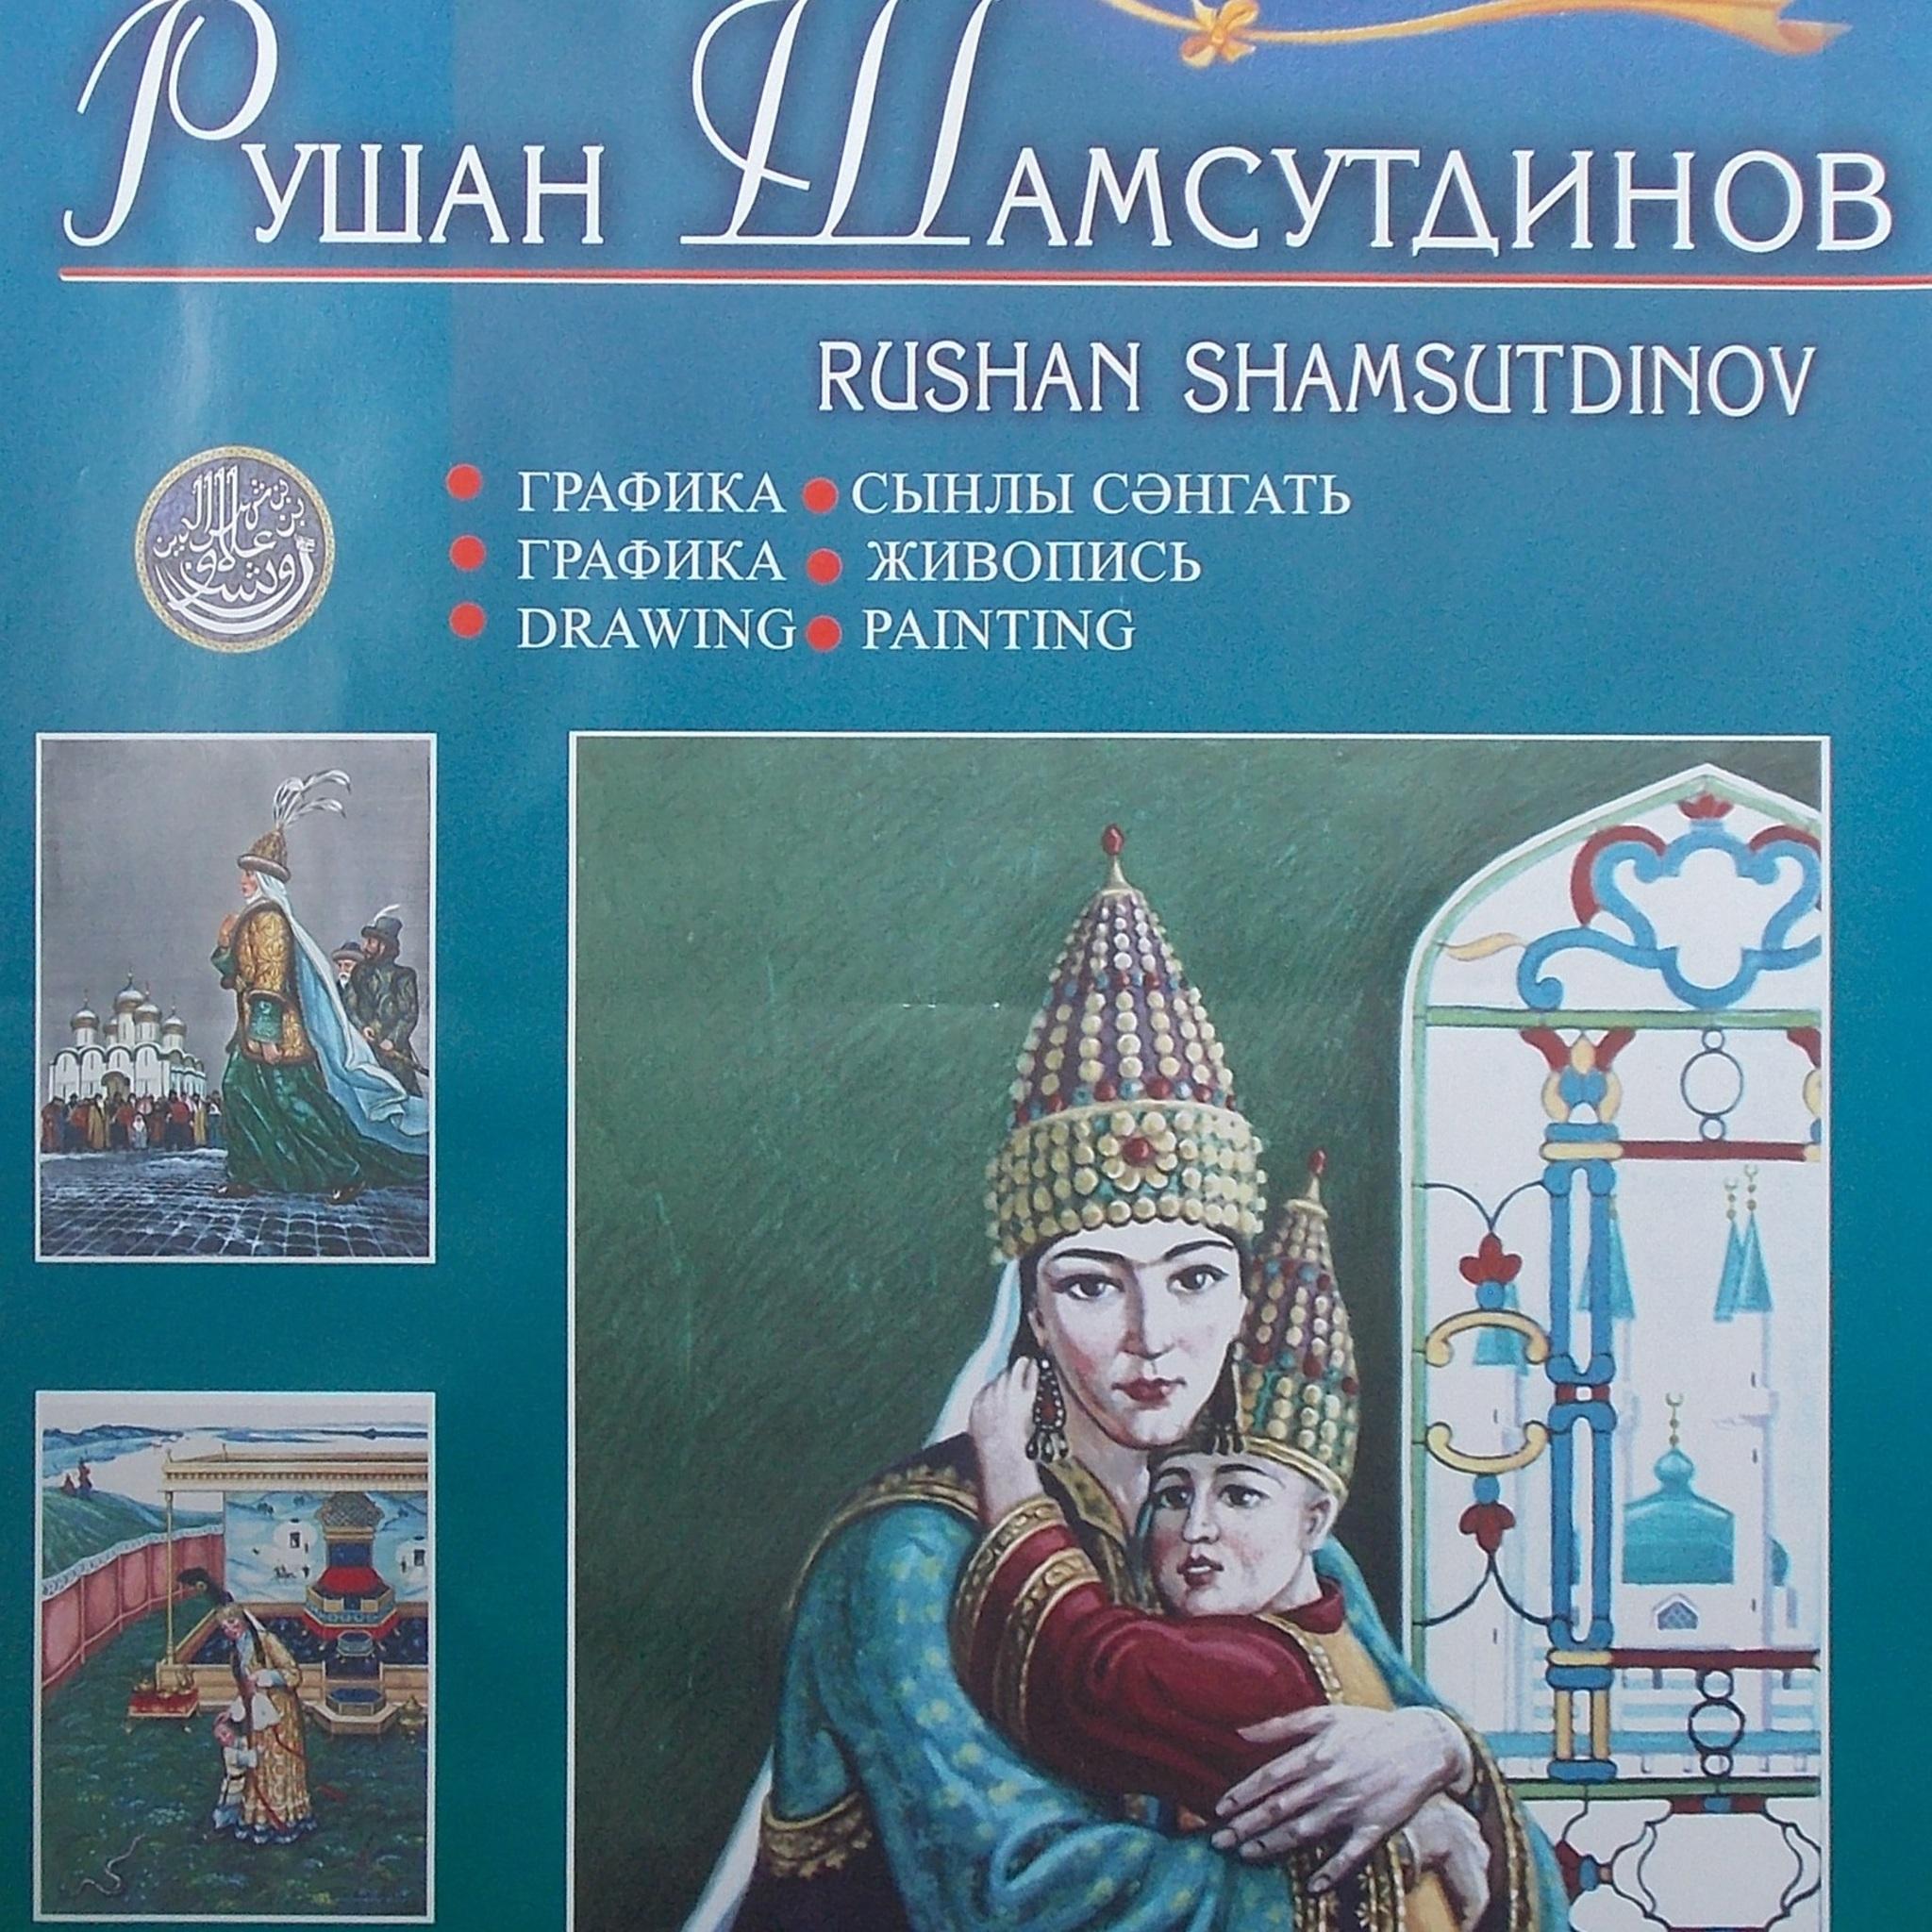 Выставка Рушана Шамсутдинова